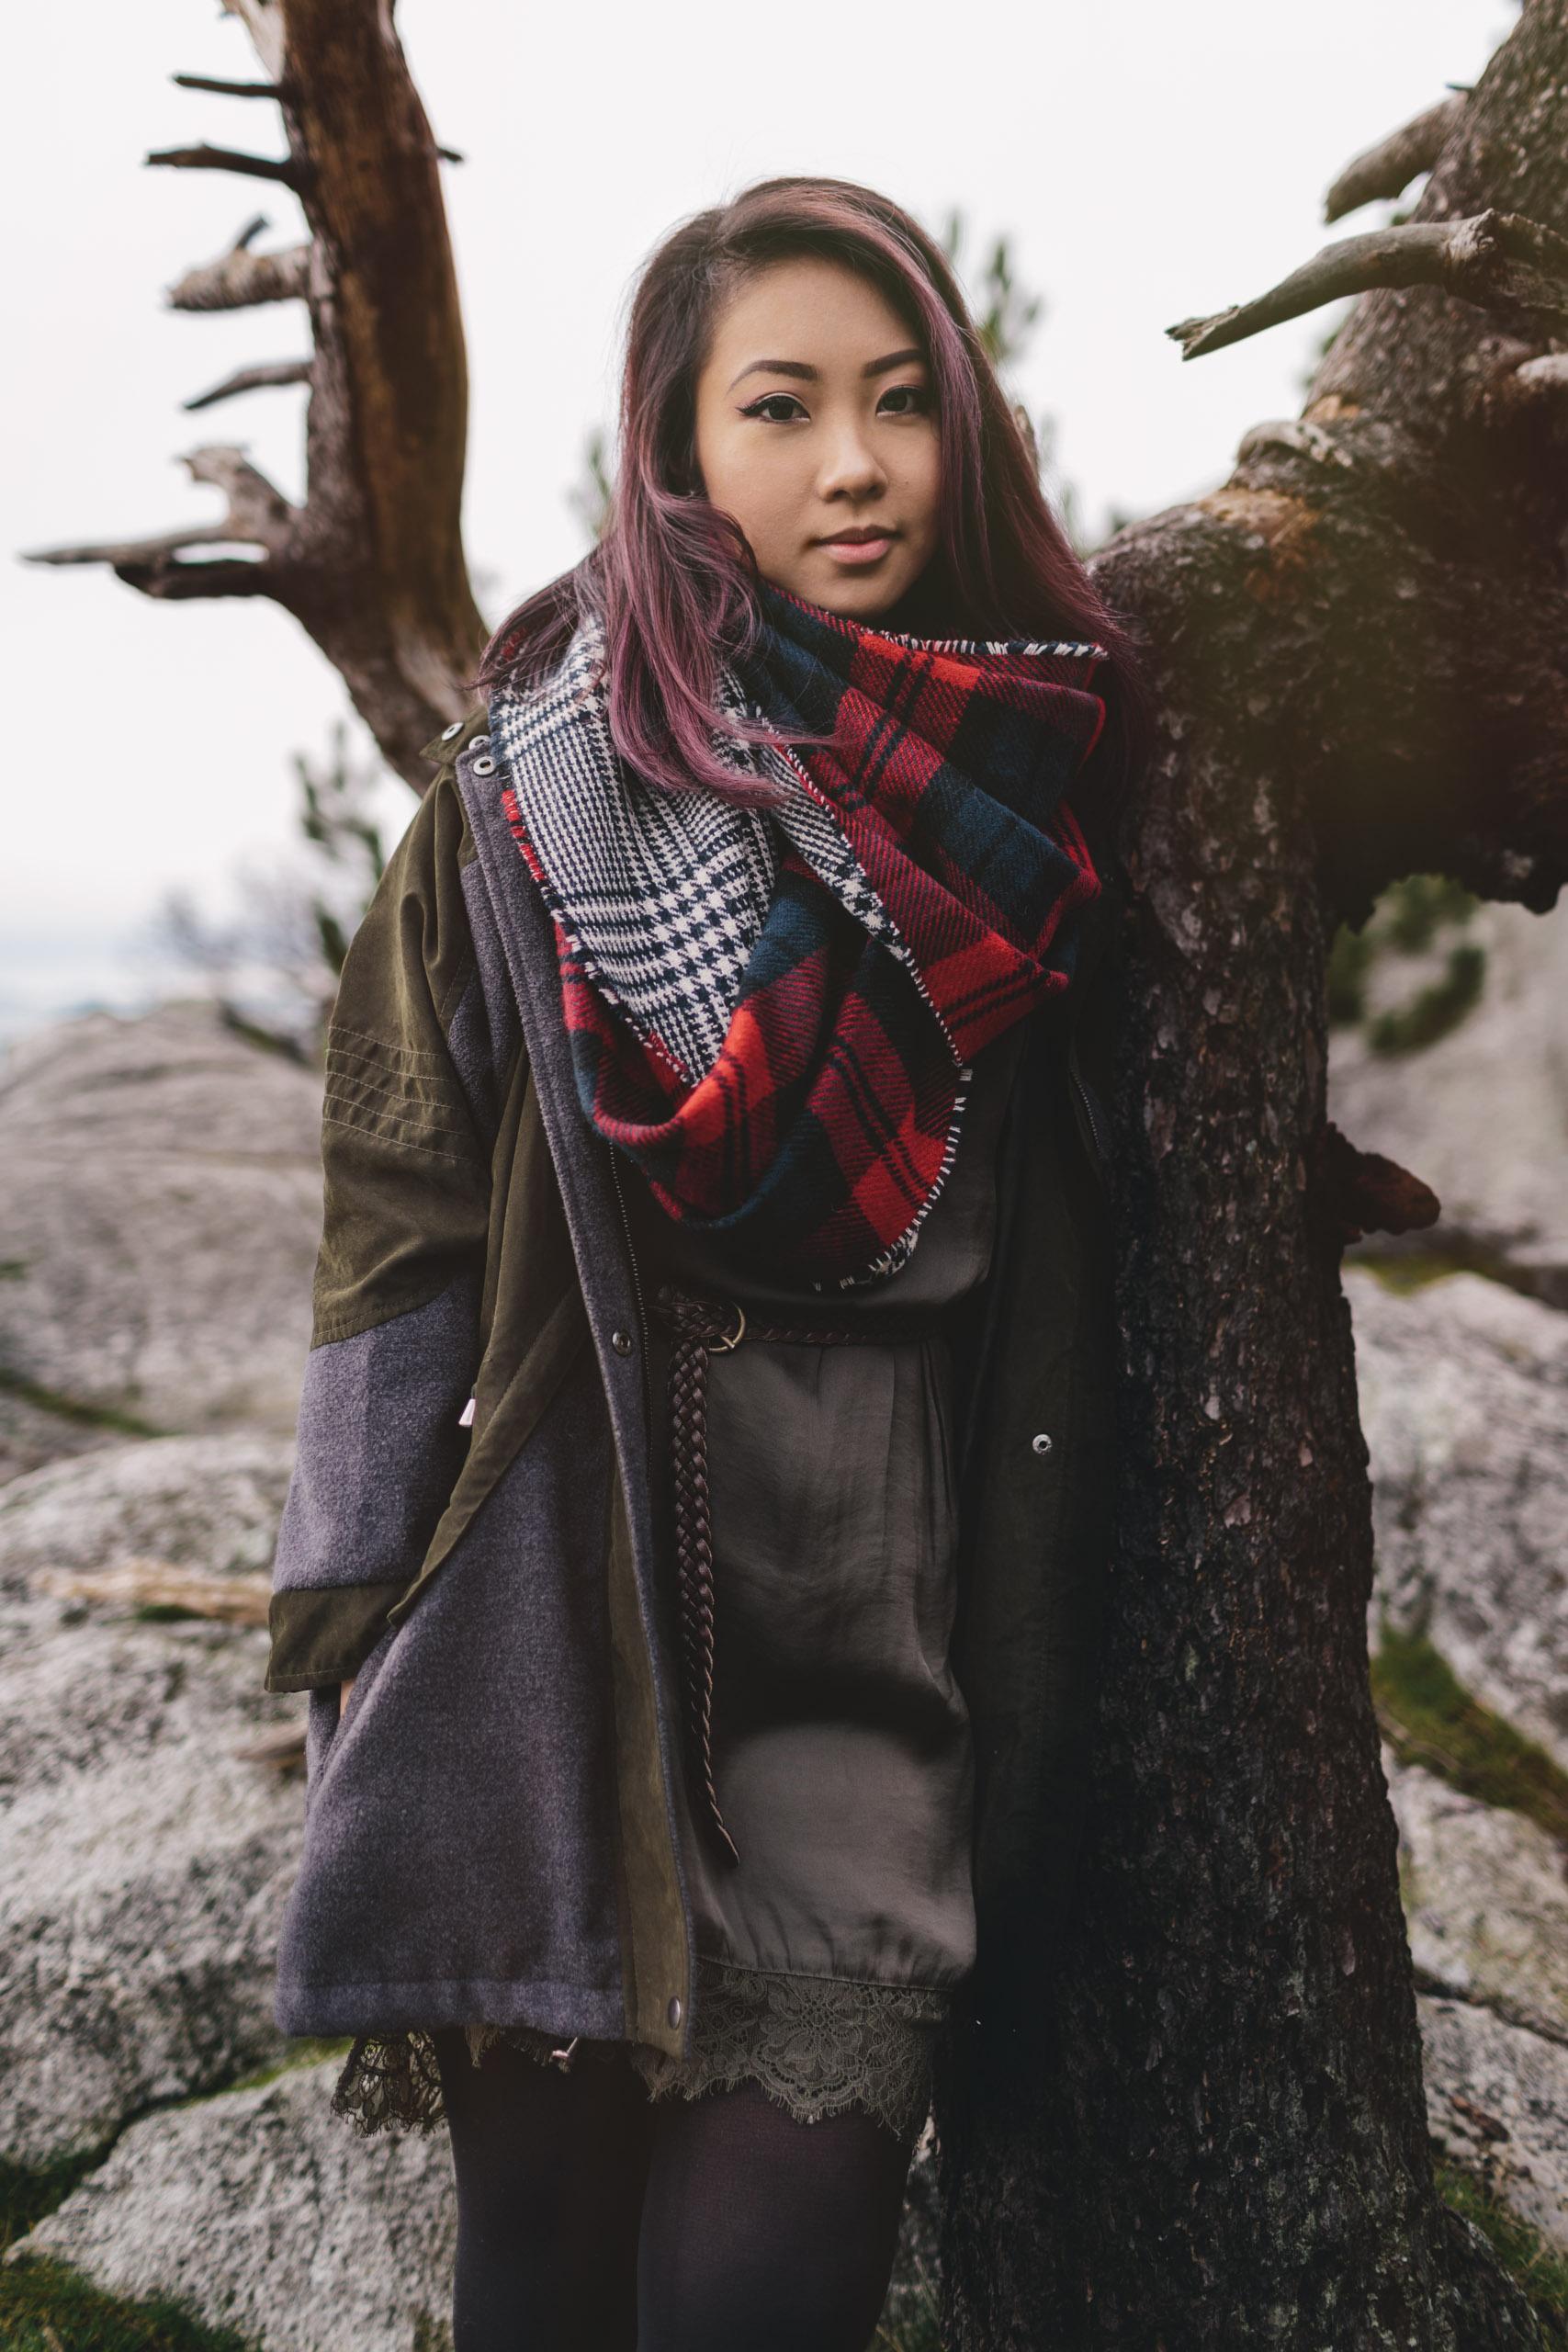 vancouver portrait photography of Tien Nguyen